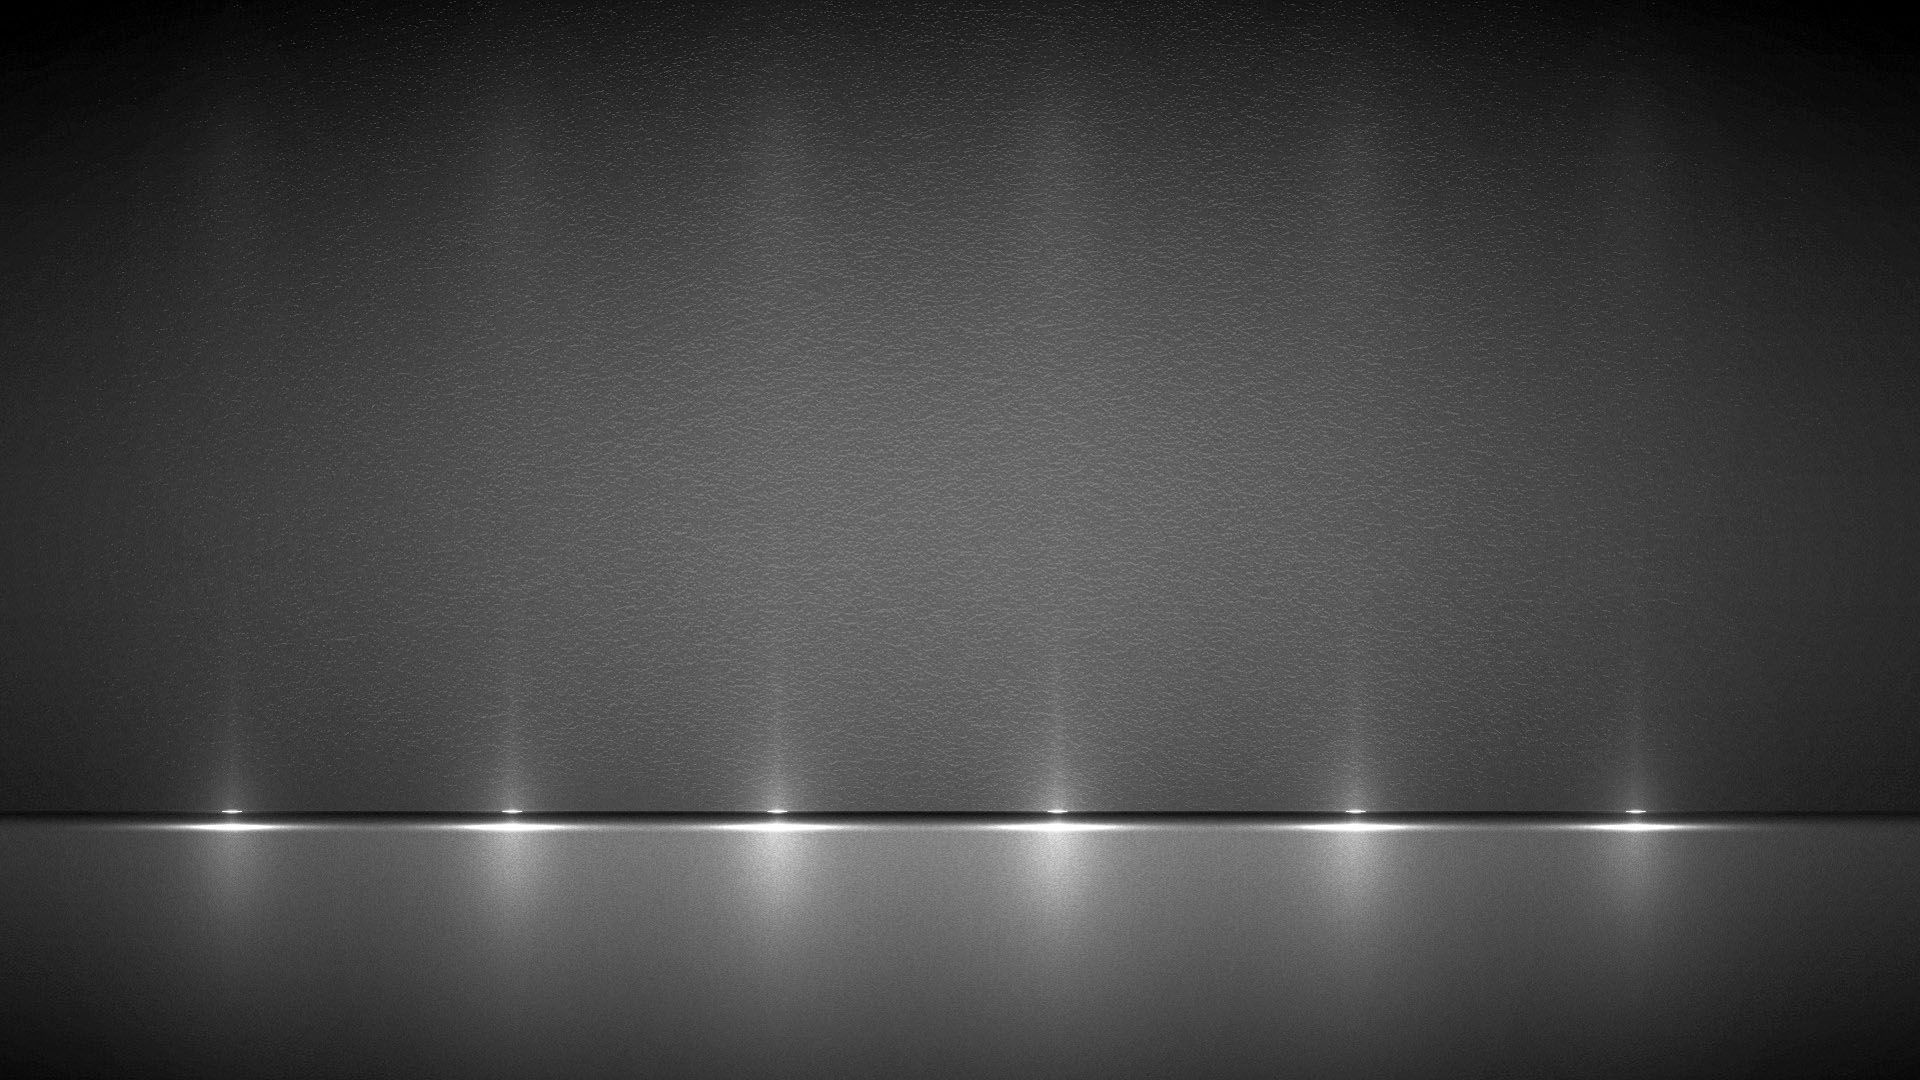 elegant-background-grey-illumination-wallpaper-copy1.jpg